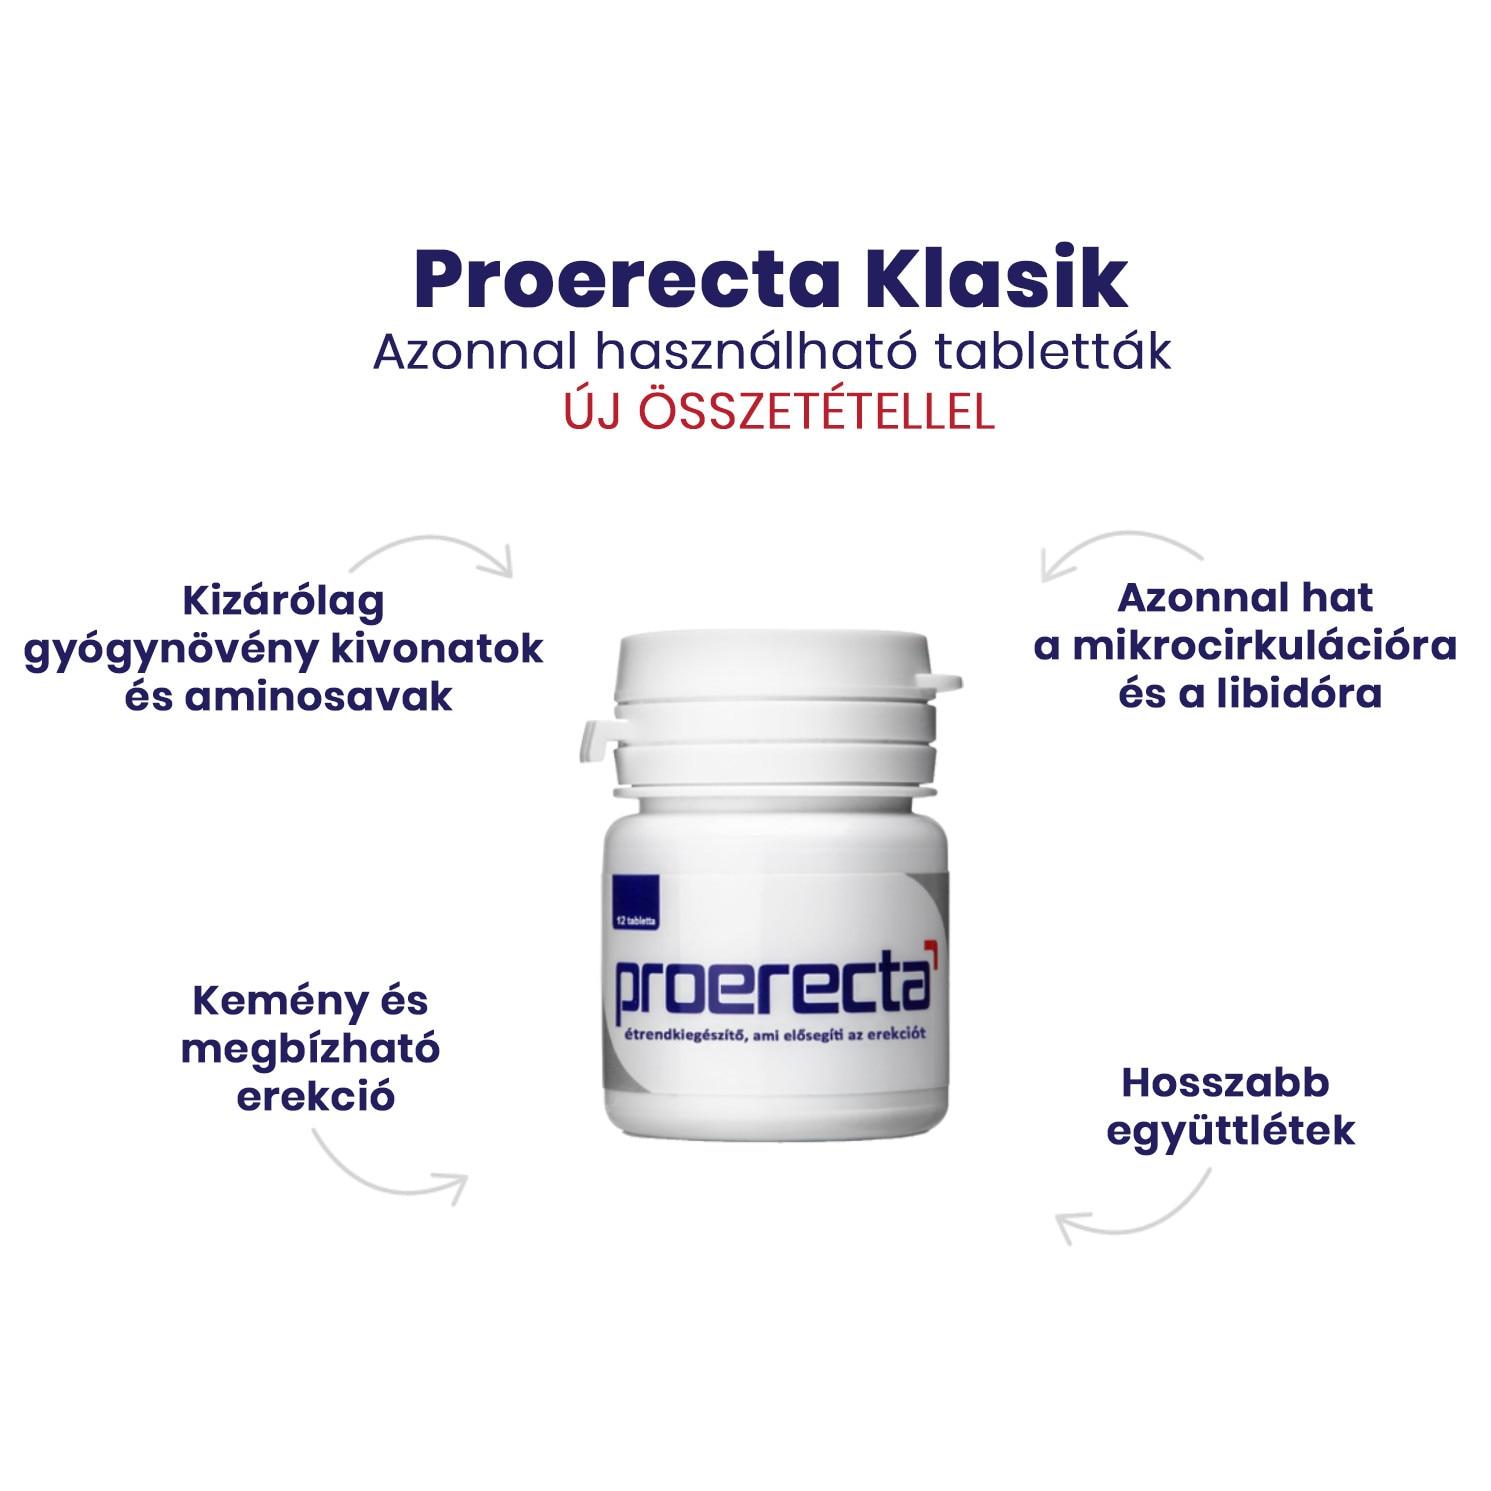 Proerecta Klasik 12x